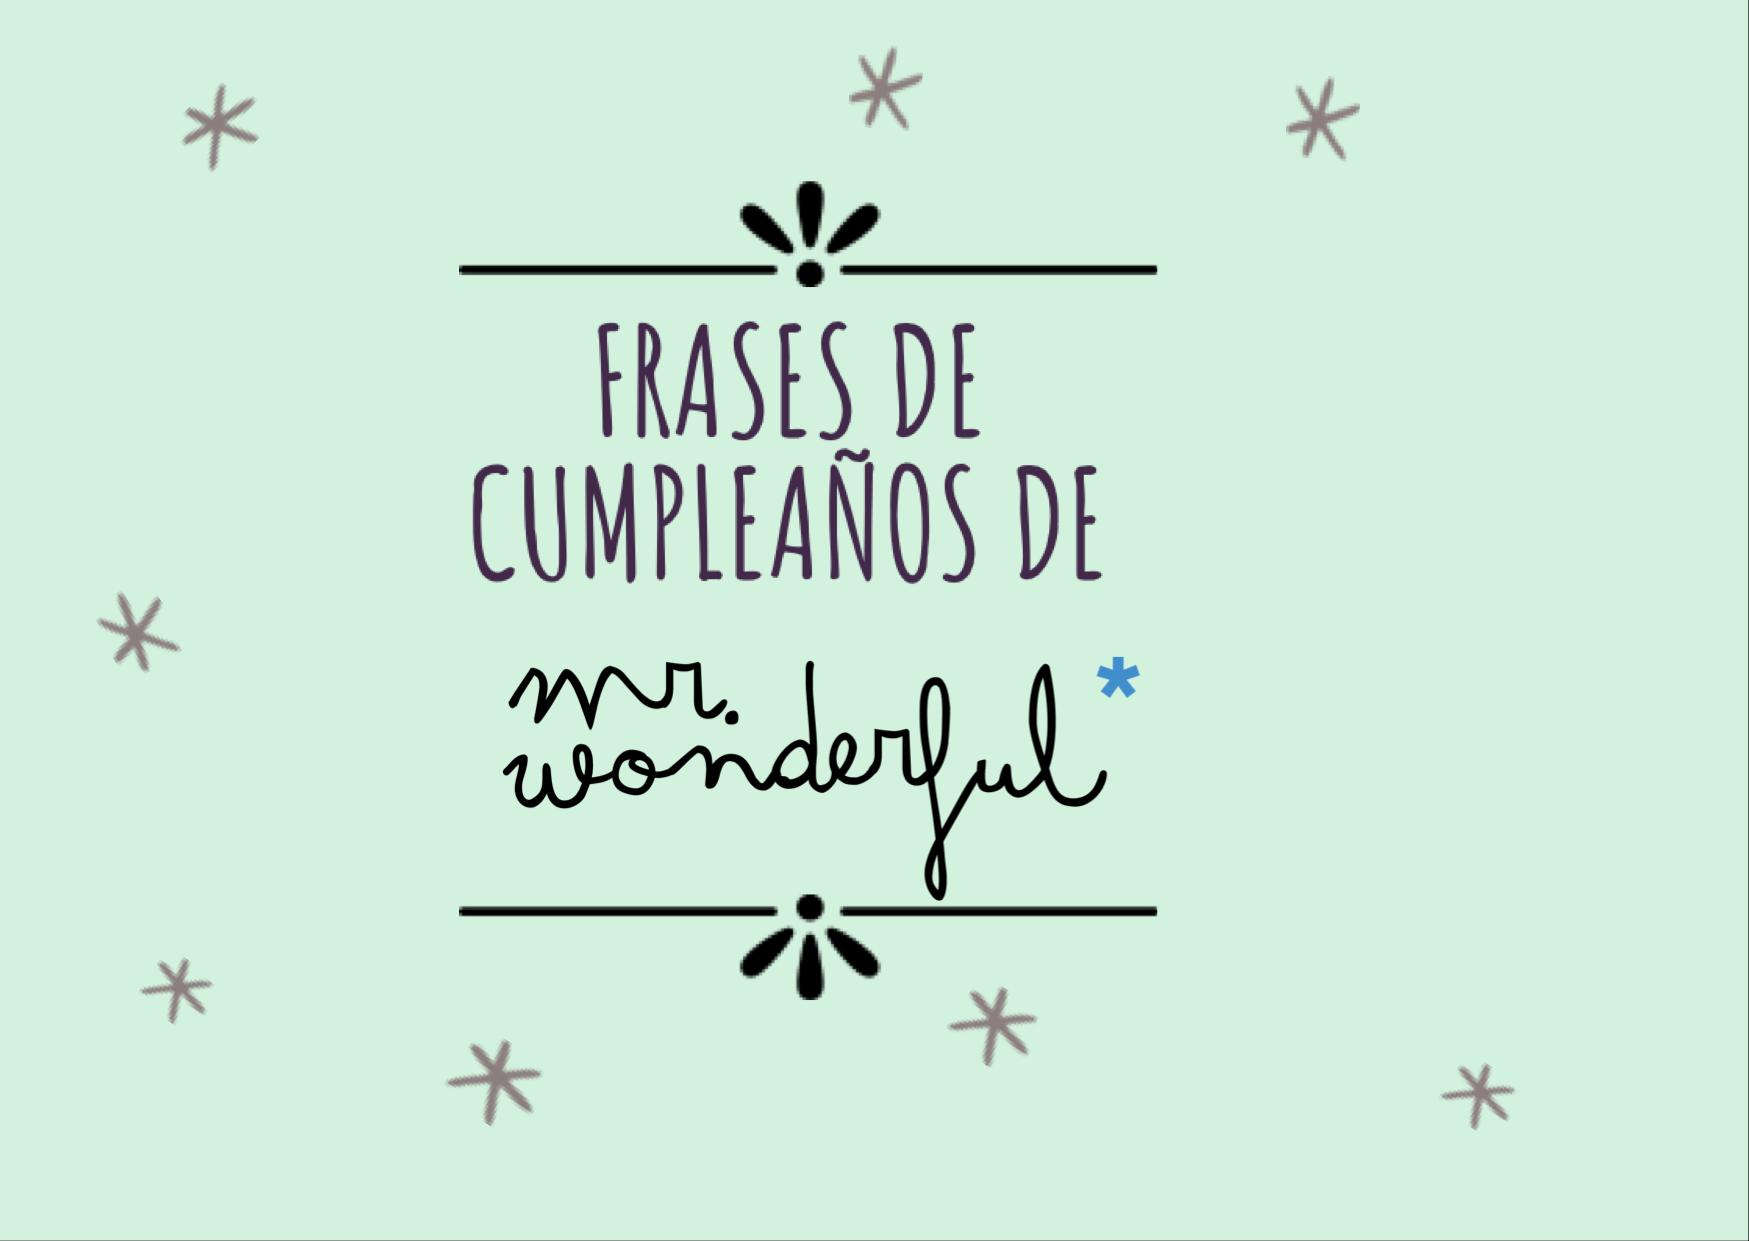 Frases de cumpleaños de Mr Wonderful